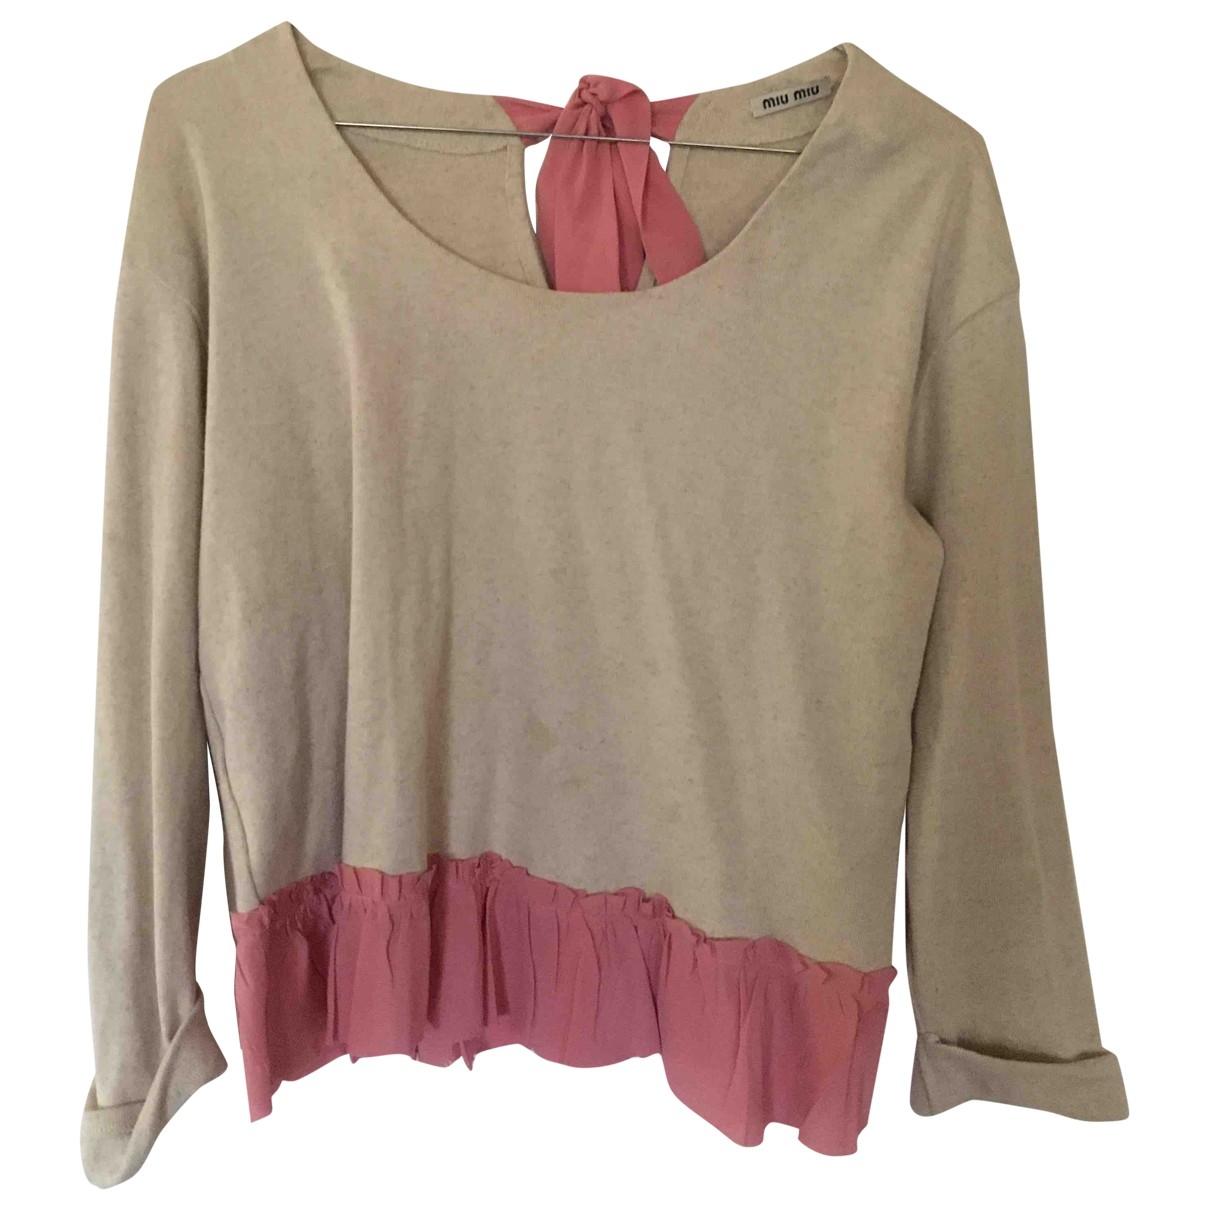 Miu Miu - Top   pour femme en coton - beige